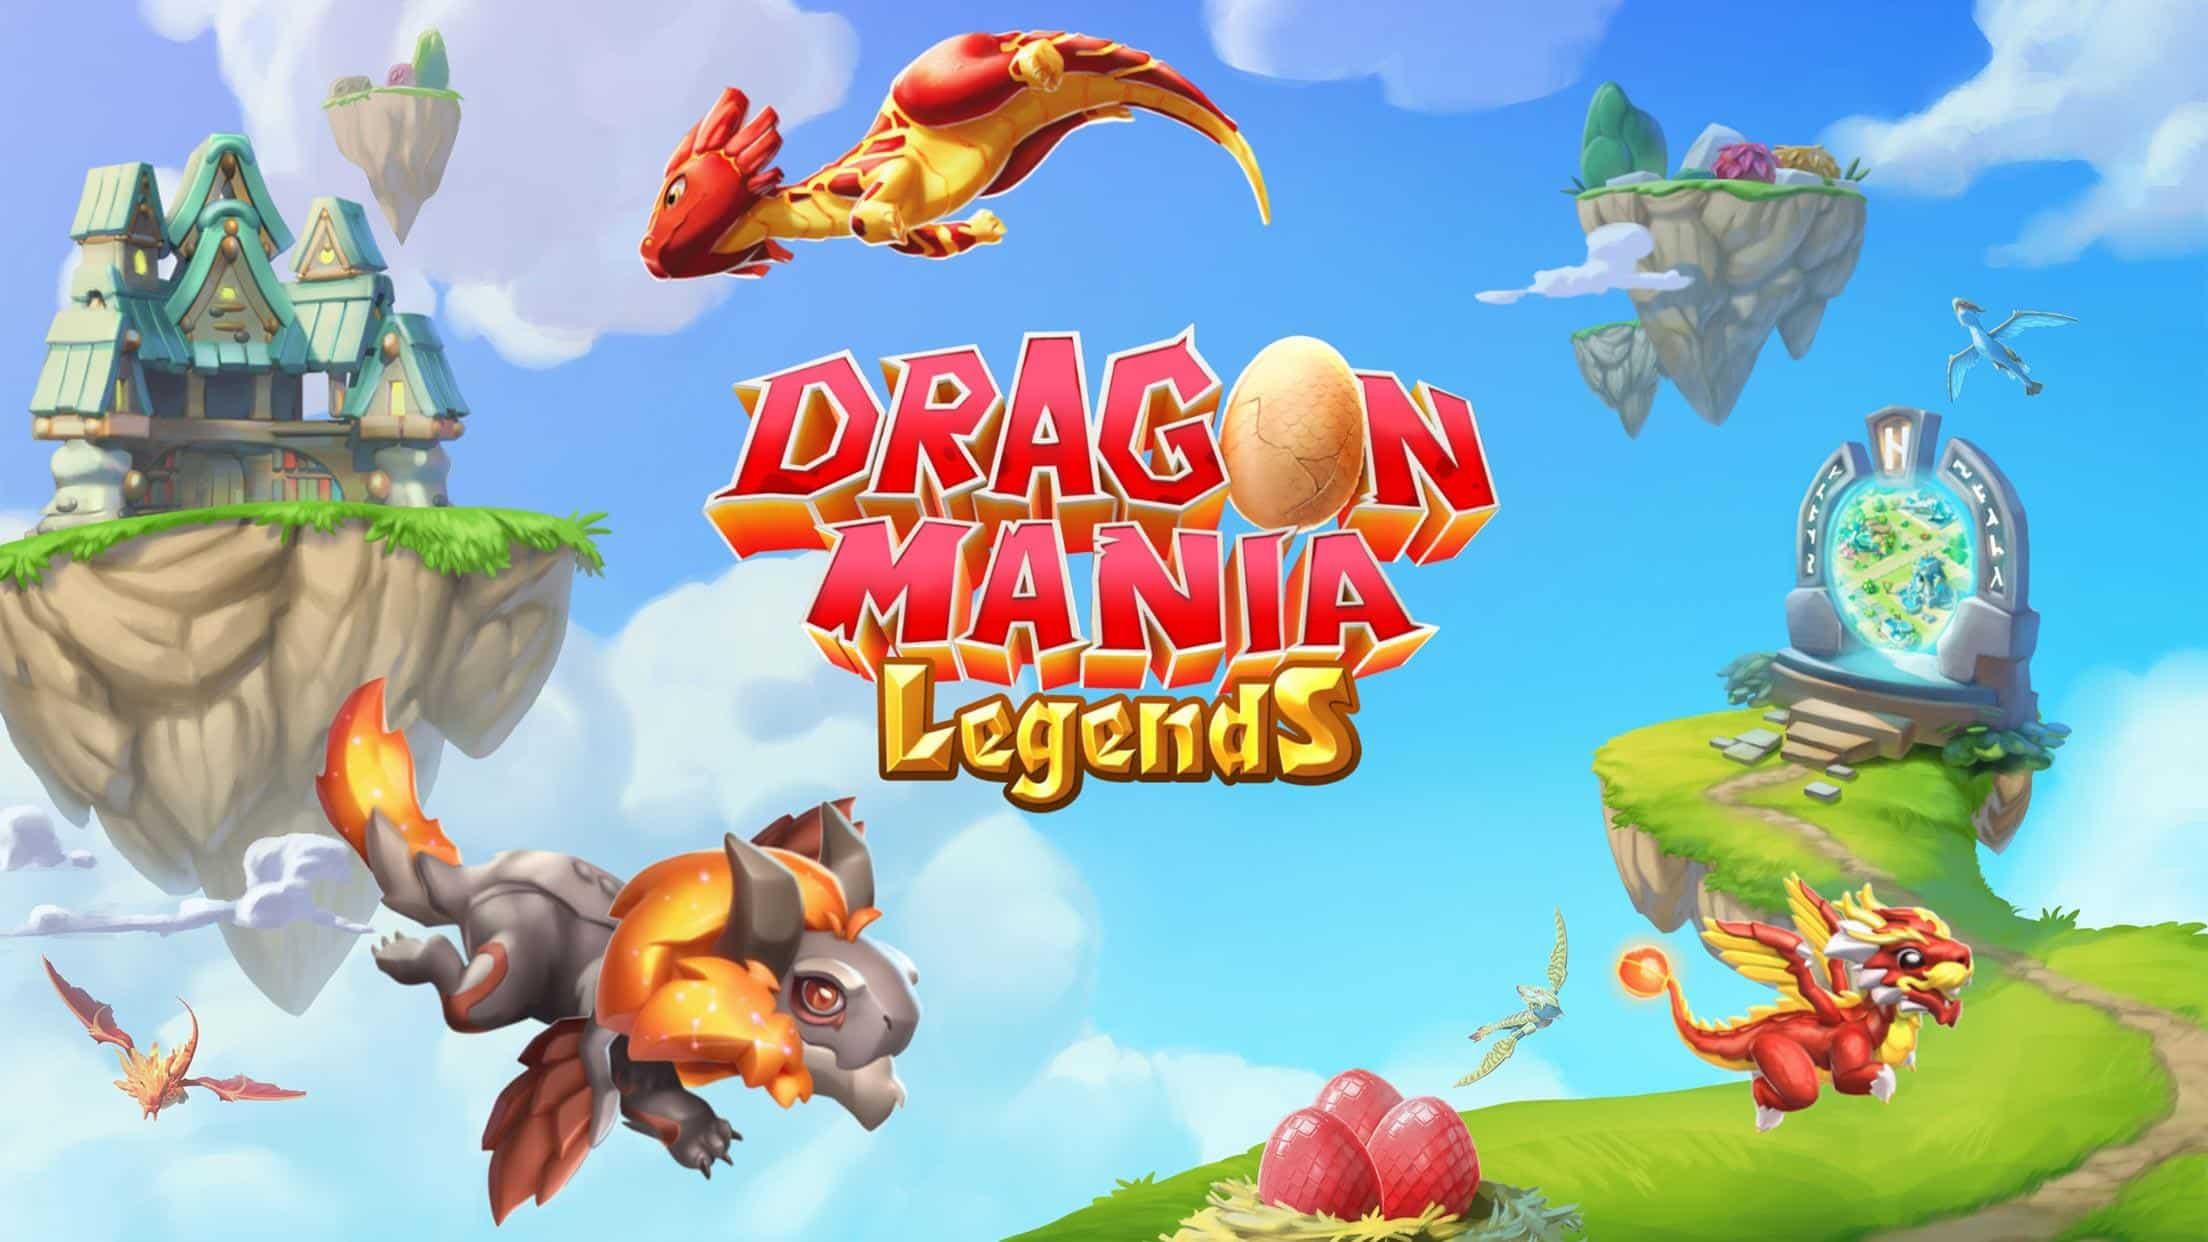 Link-Download-Dragon-Mania-Legends-Mod-Apk